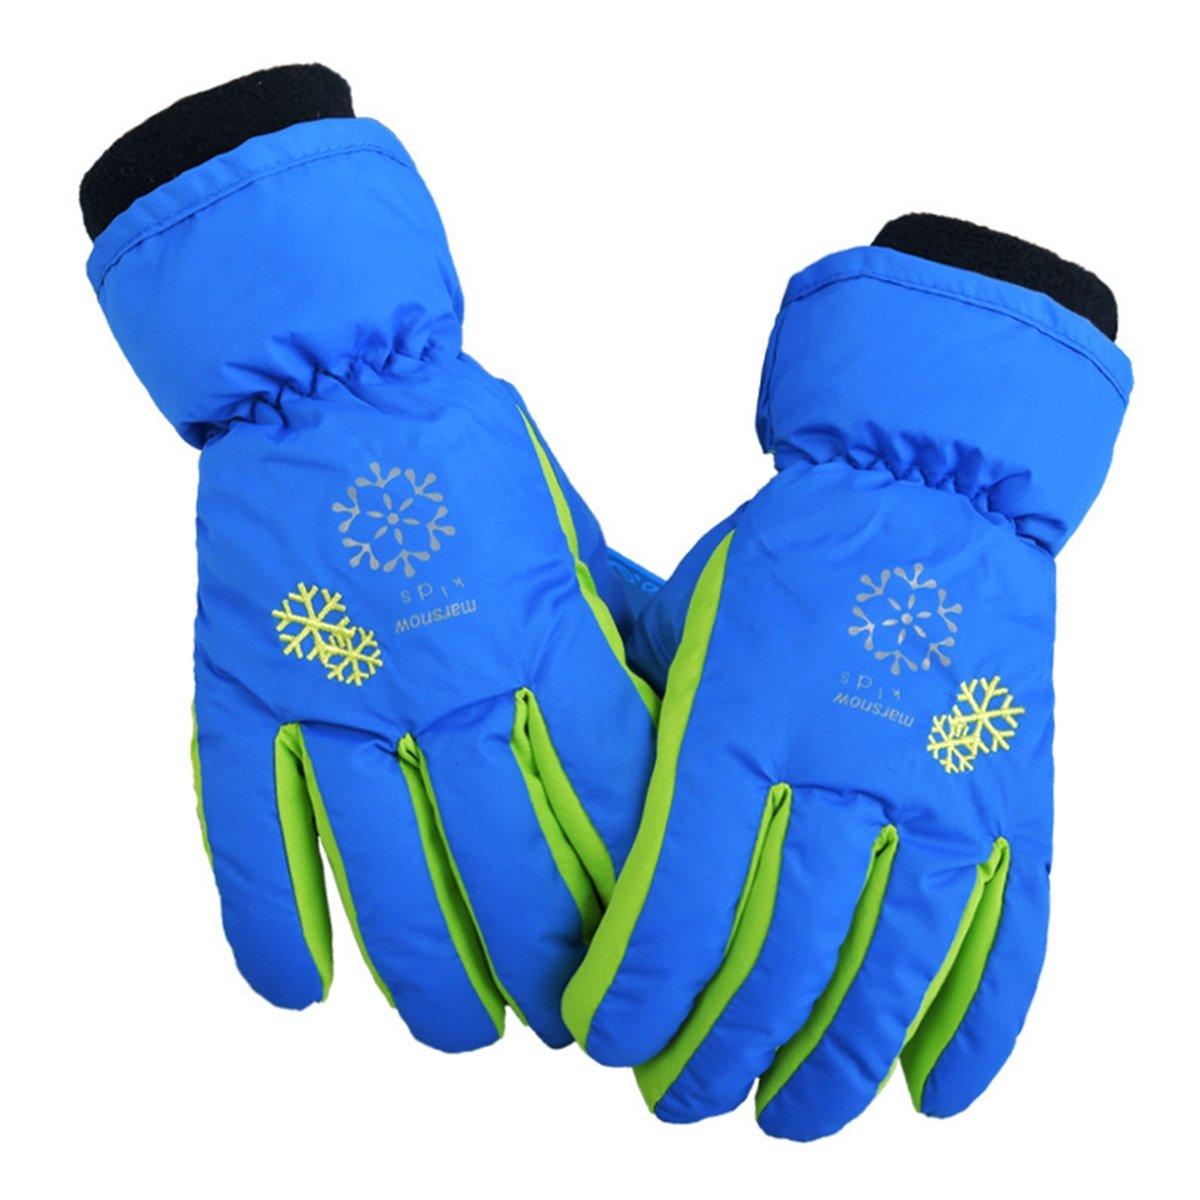 Ski Gloves Waterproof Warm Snowboard Gloves Winter Kid Skiing Gloves